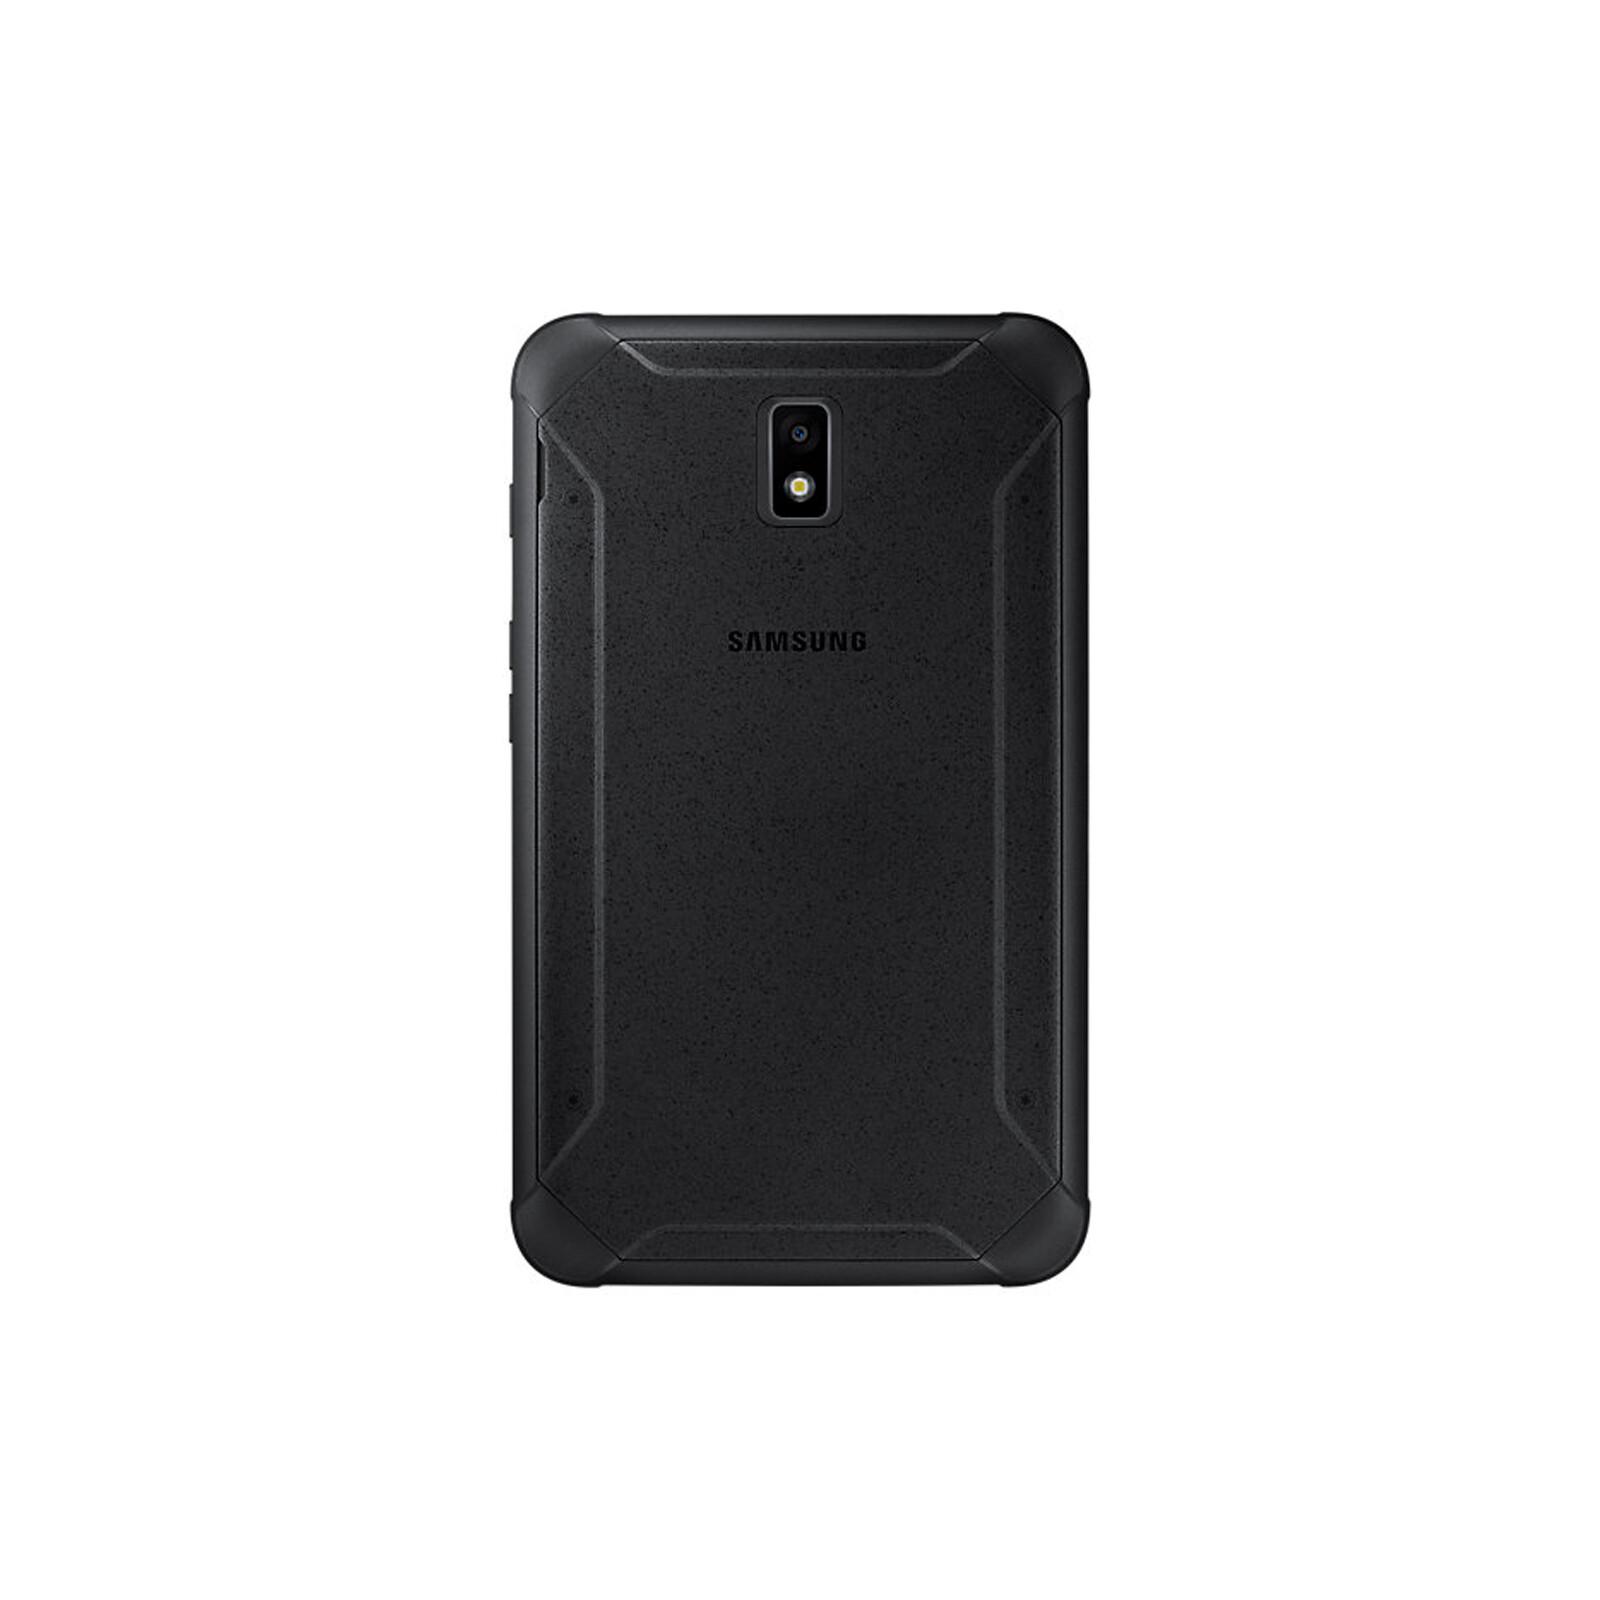 Samsung Galaxy Tab Active 2 LTE T395